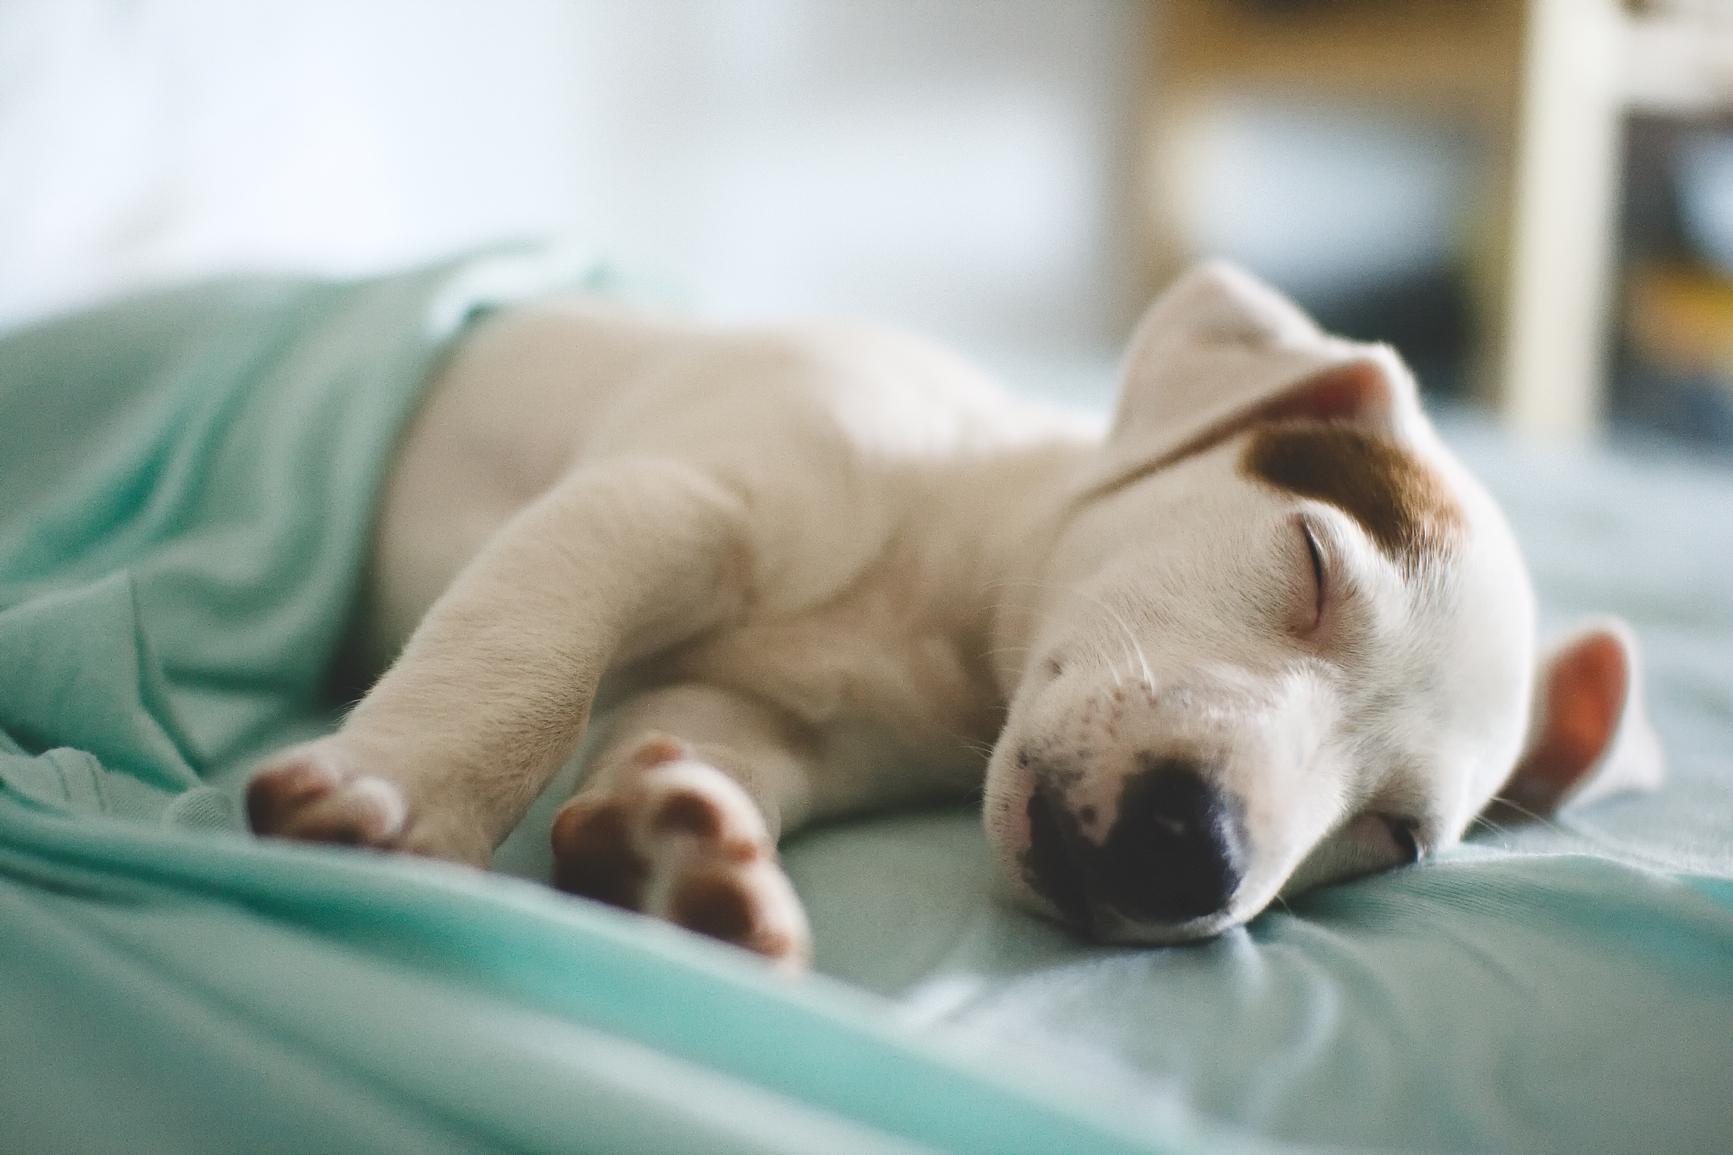 Yorkville, Dog Daycare, Grooming, Groom, Tire Biter, Playcare, Dog Walking, Kennel Free, Boarding, Toronto